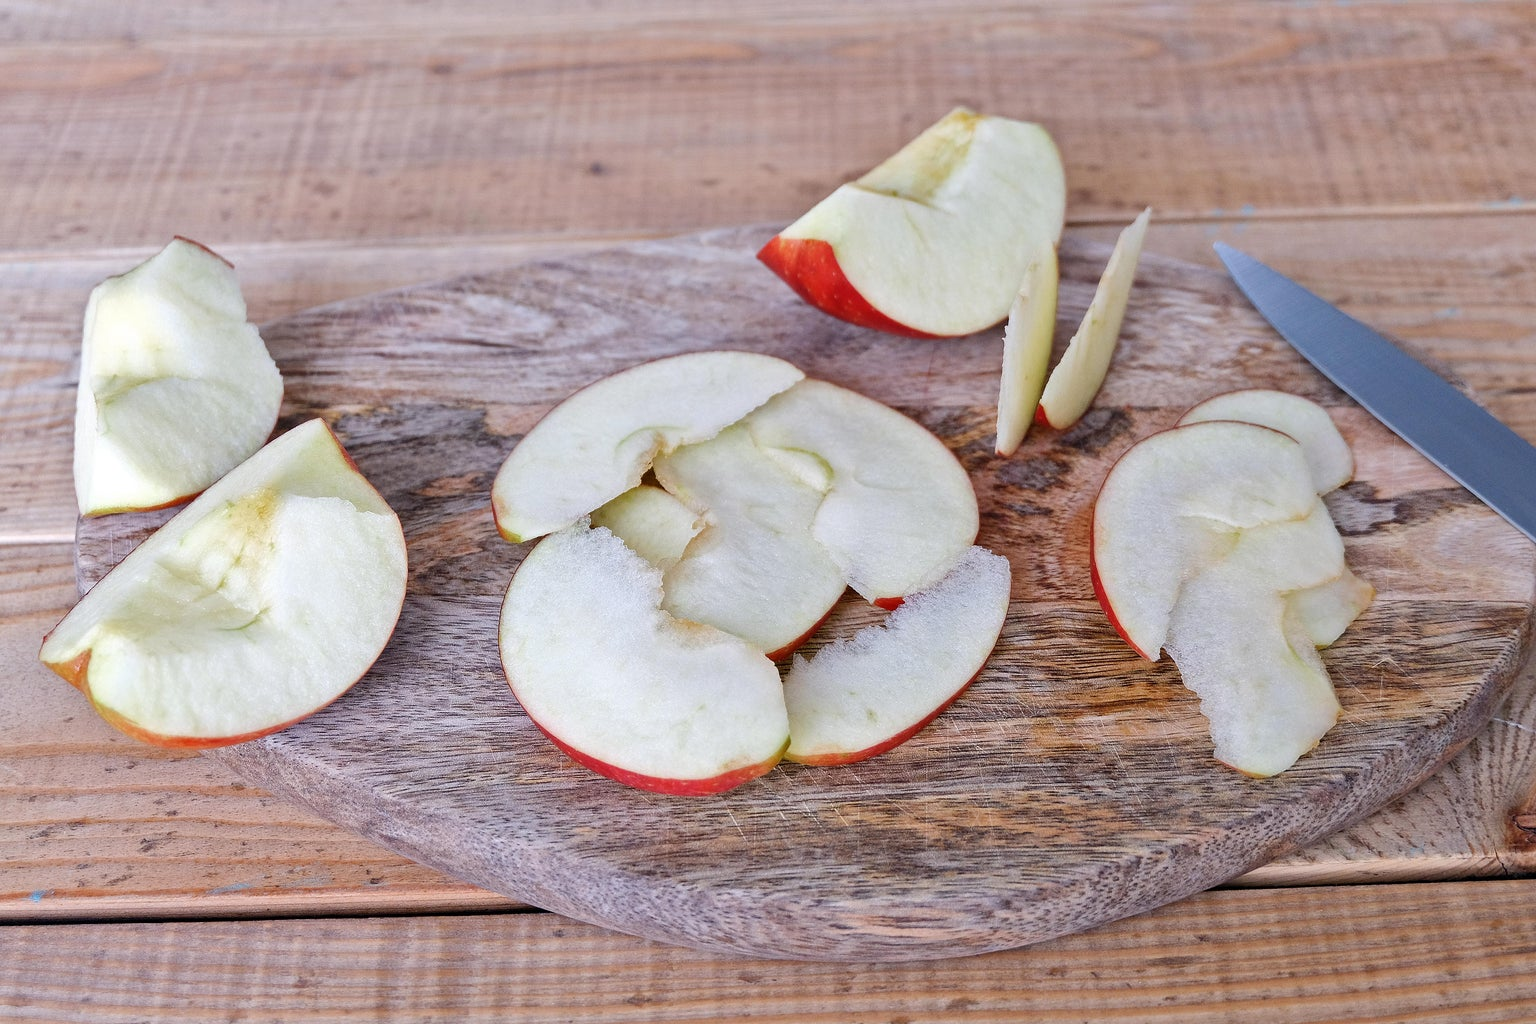 Prepare Apples